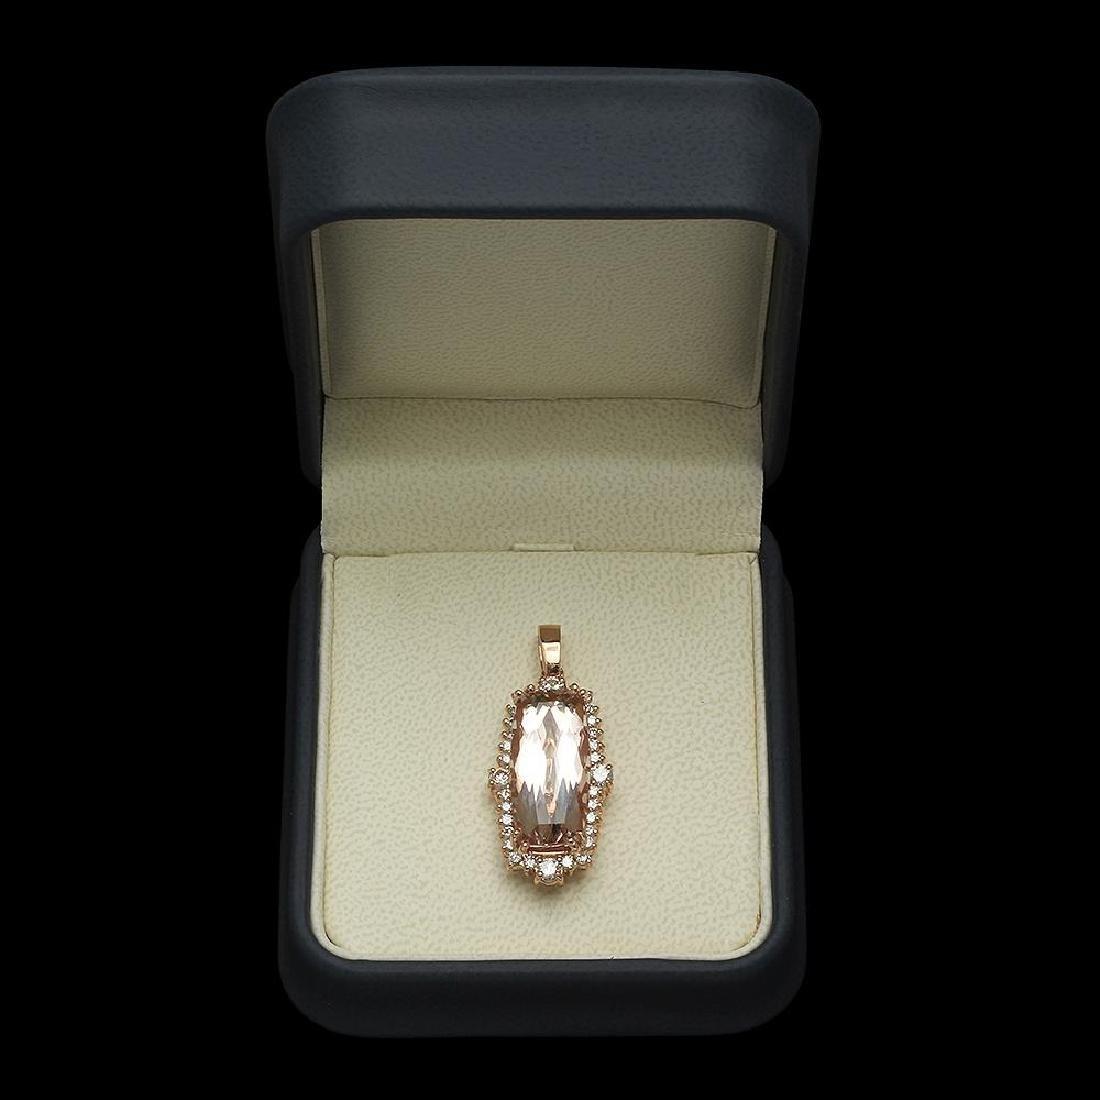 14K Gold 12.37ct Morganite 1.25ct Diamond Pendant - 3